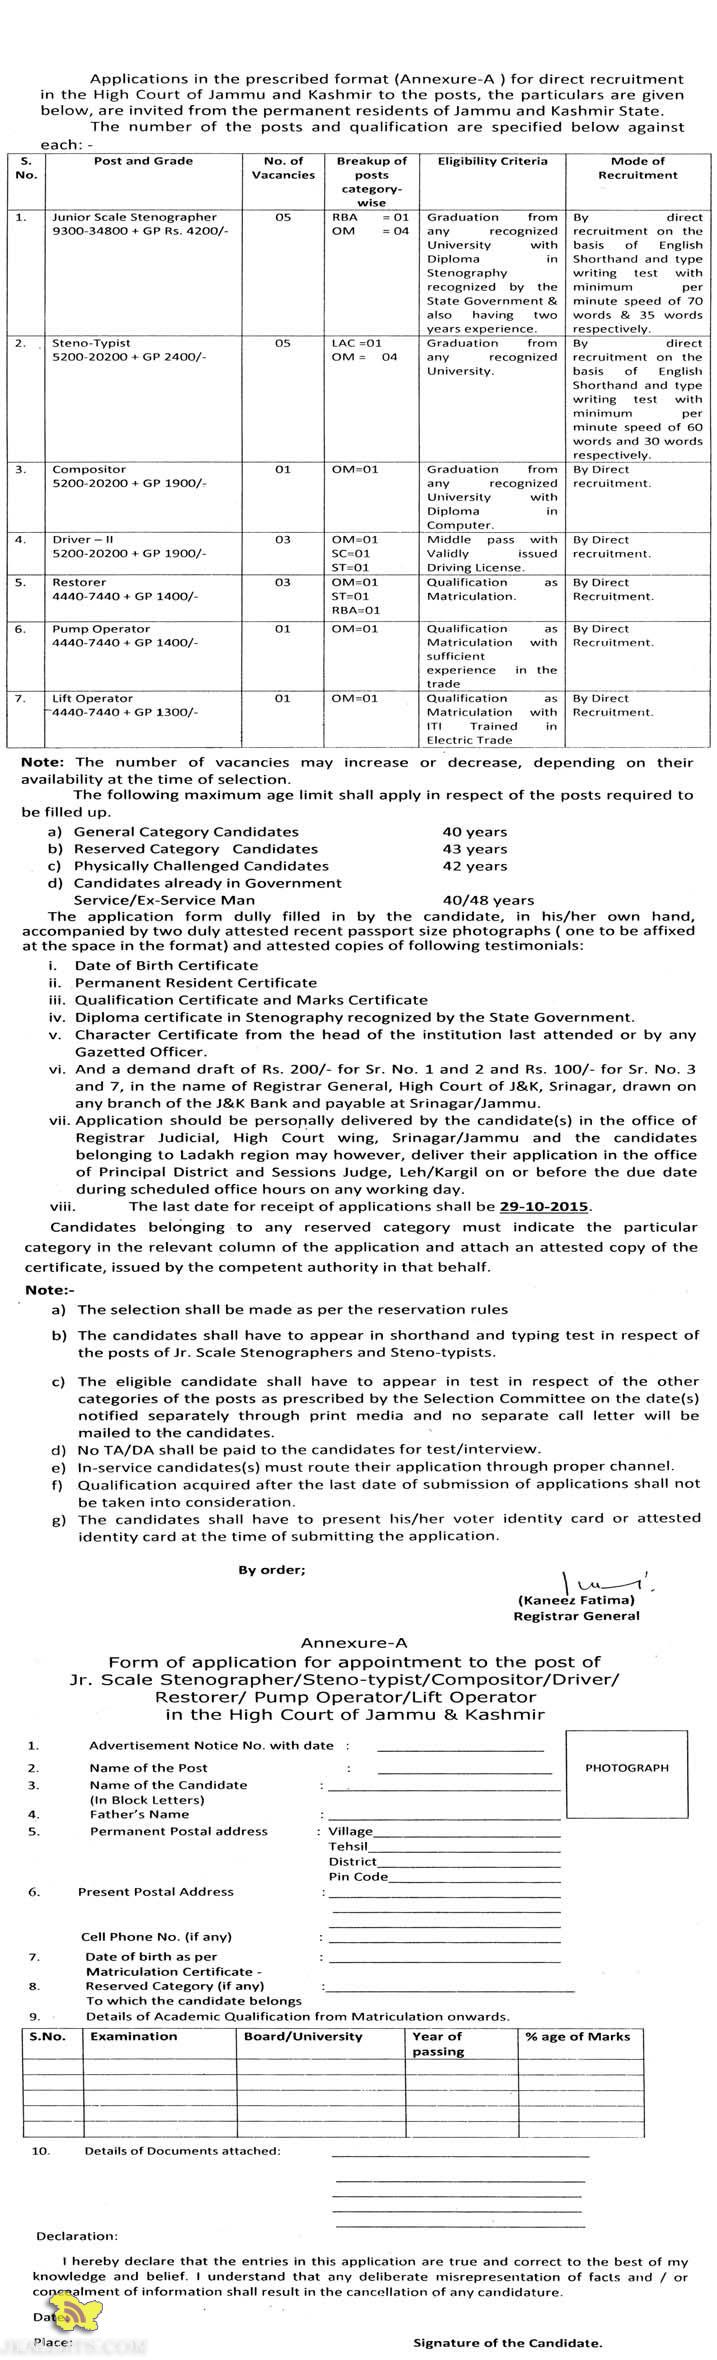 Jobs in High Court of Jammu and Kashmir, Recruitment 2015